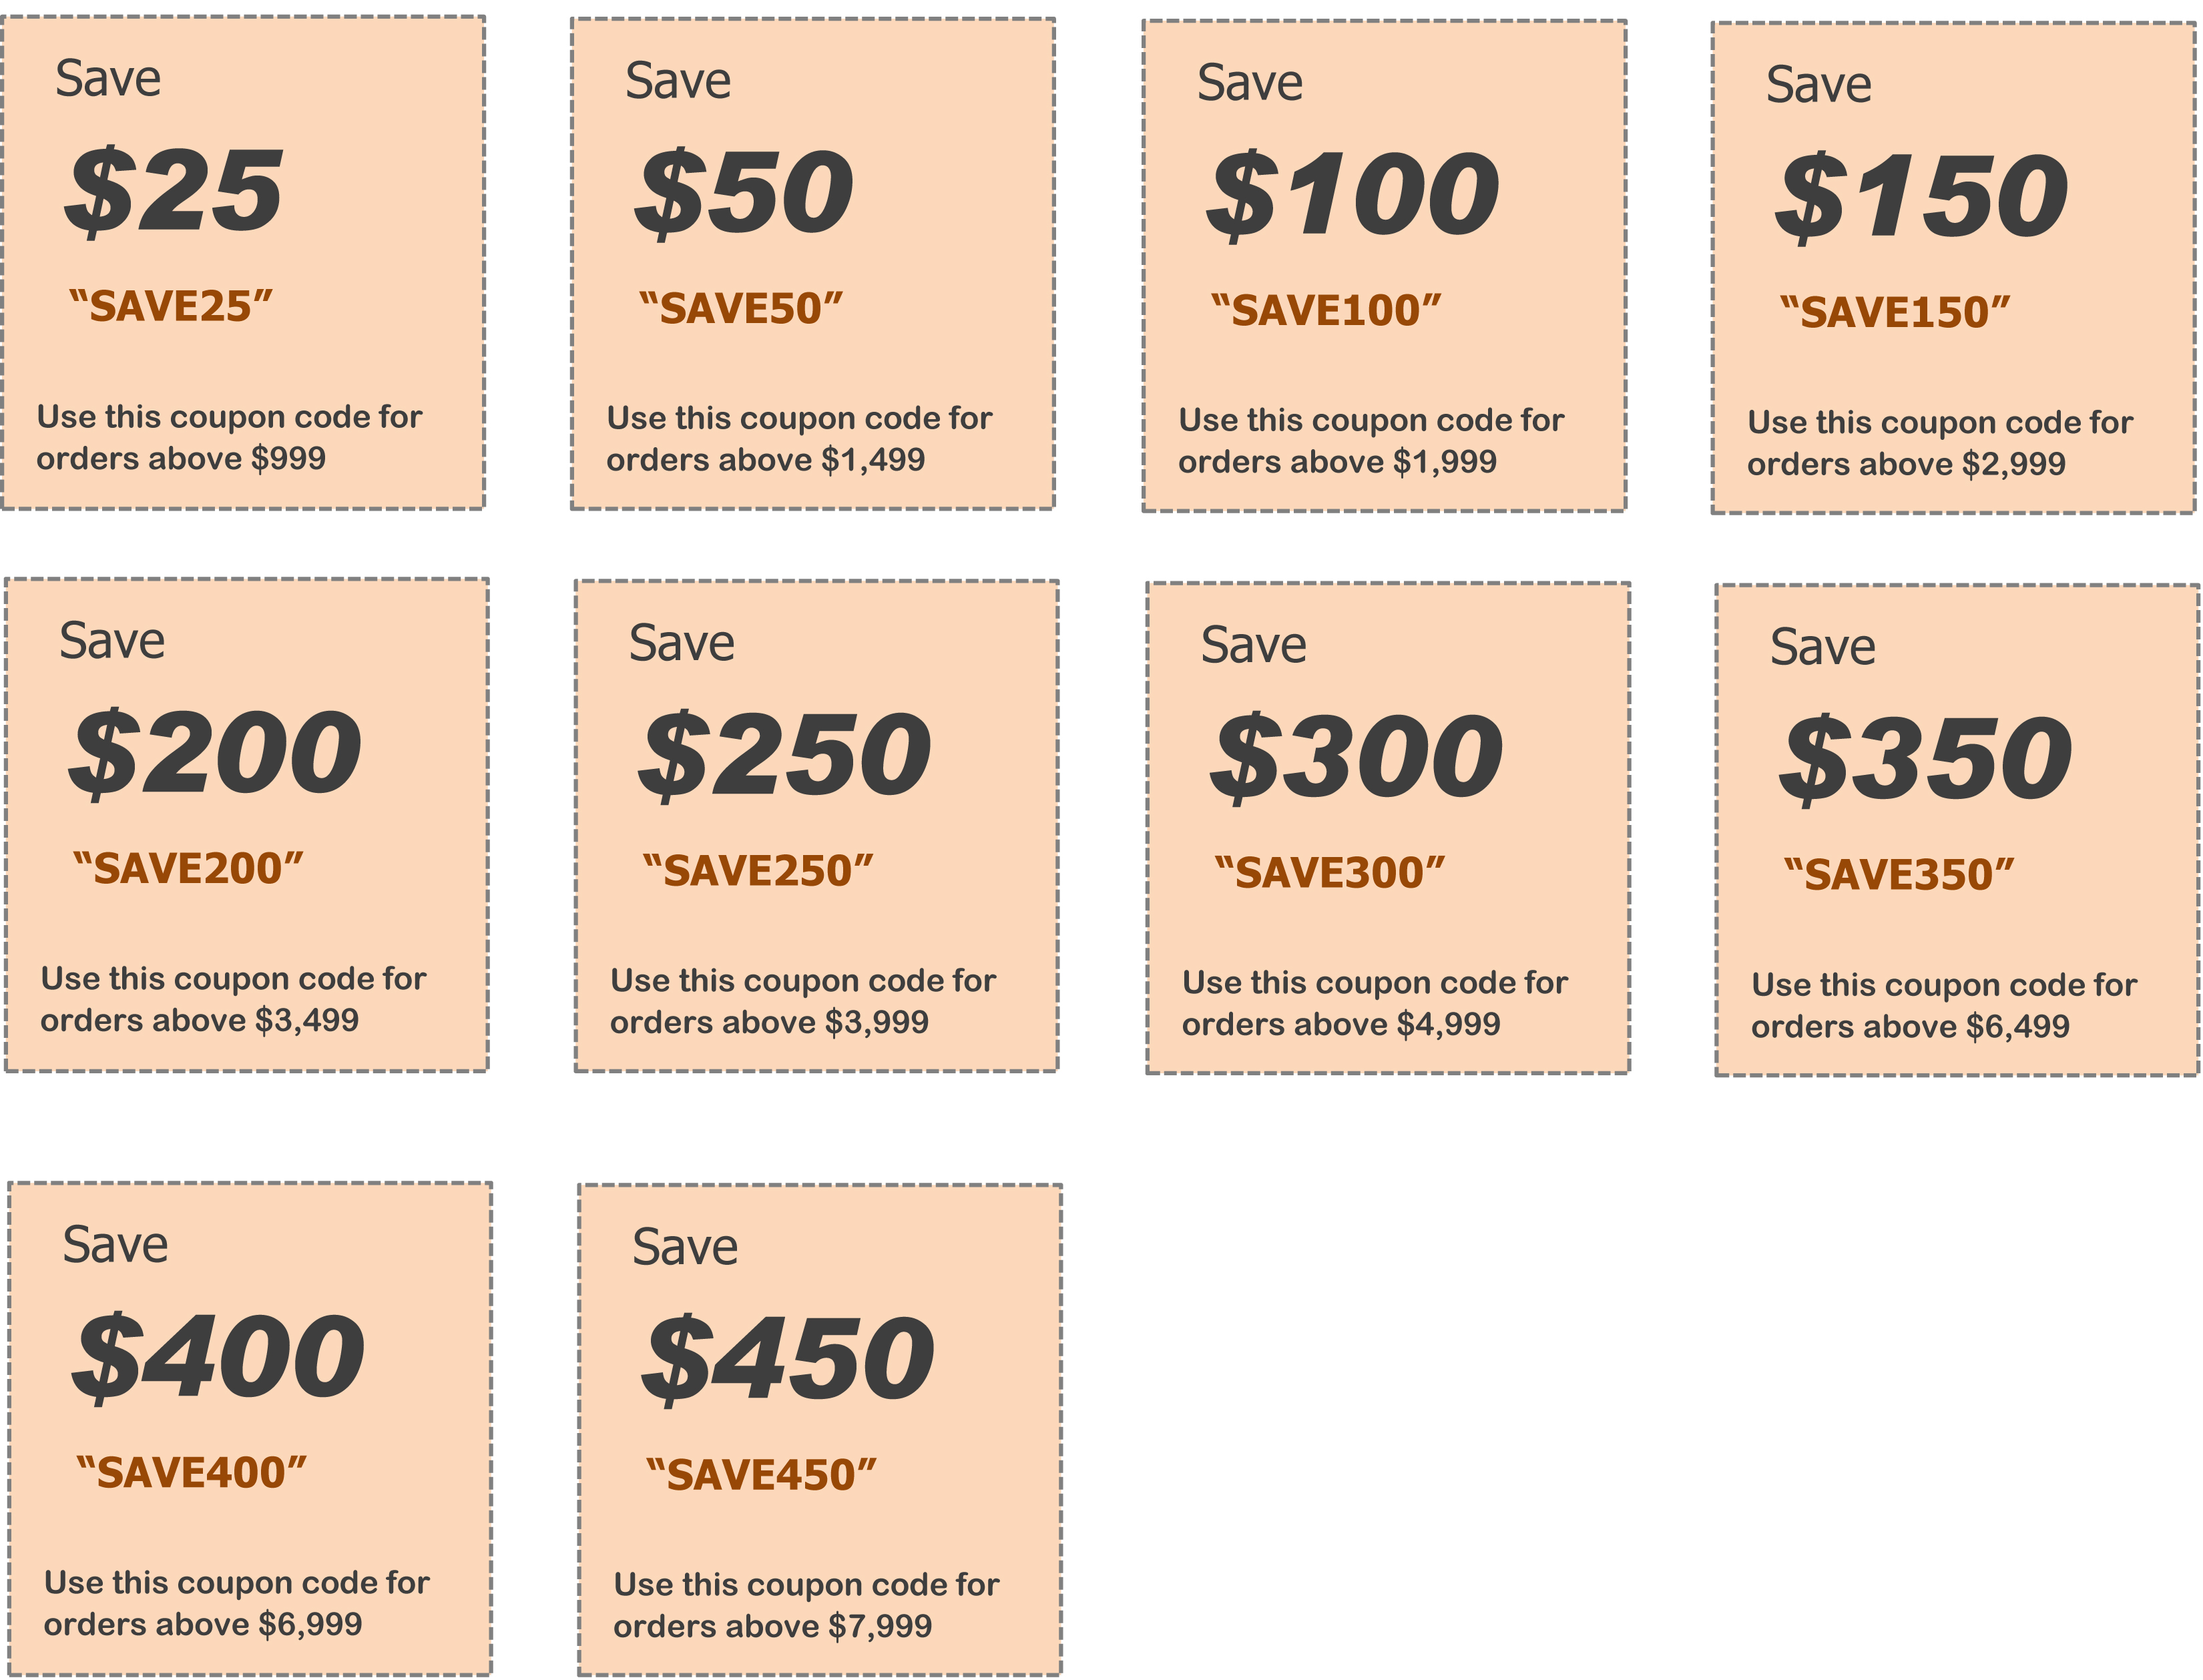 jbb-coupon-codes-page-revised-2021-2.jpg